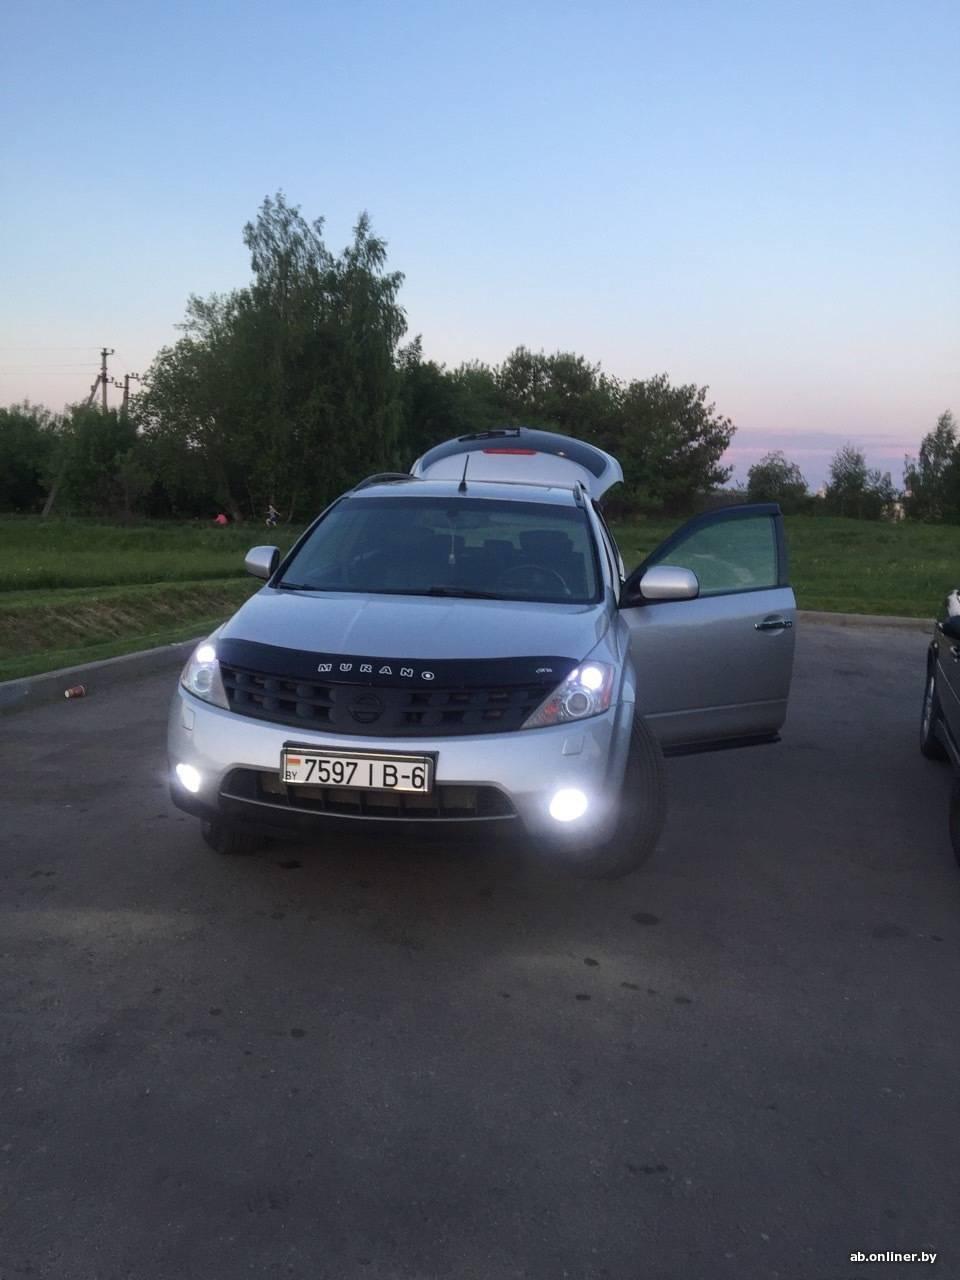 Nissan Murano S. ЕВРОПЕЕЦ.